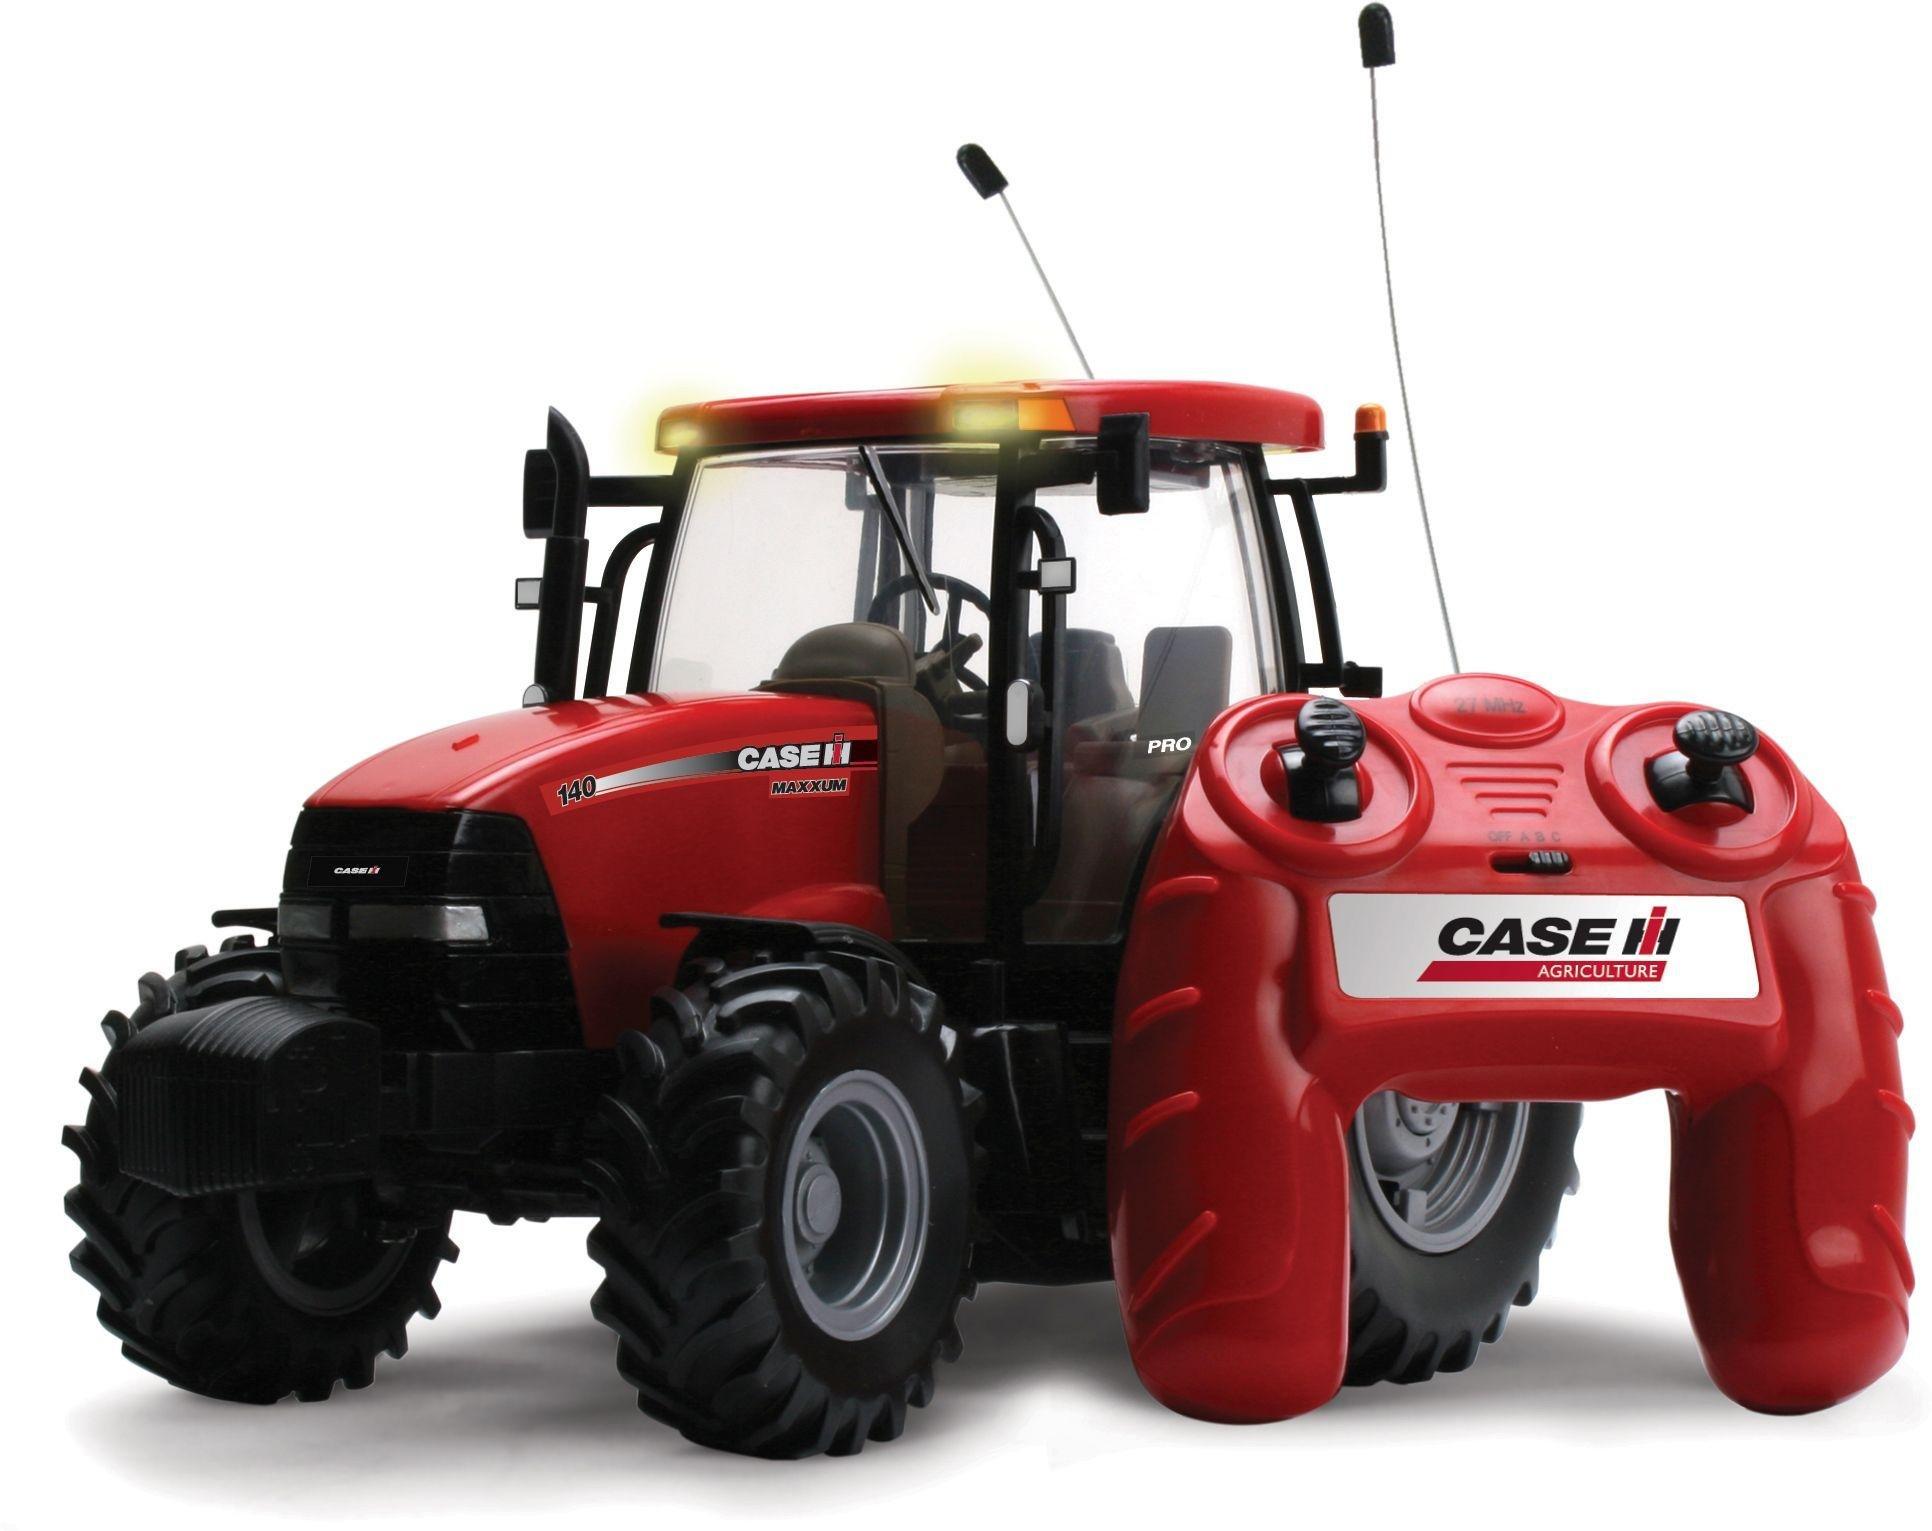 Image of Britians Big Farm - Radio Controlled Case - 1H 140 Tractor